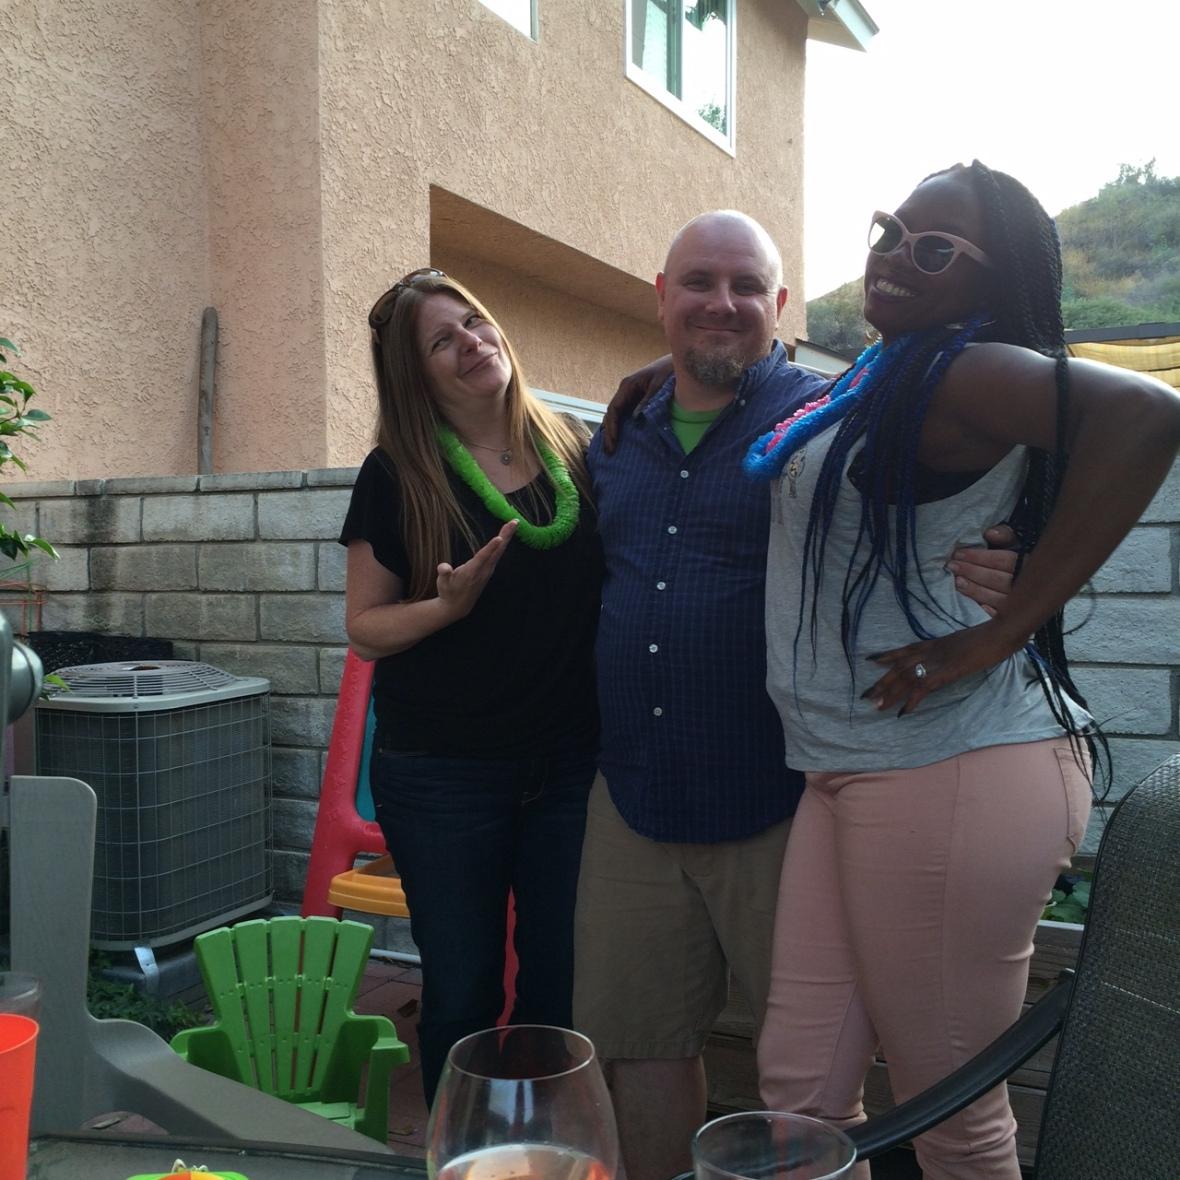 Greg, Raven and I